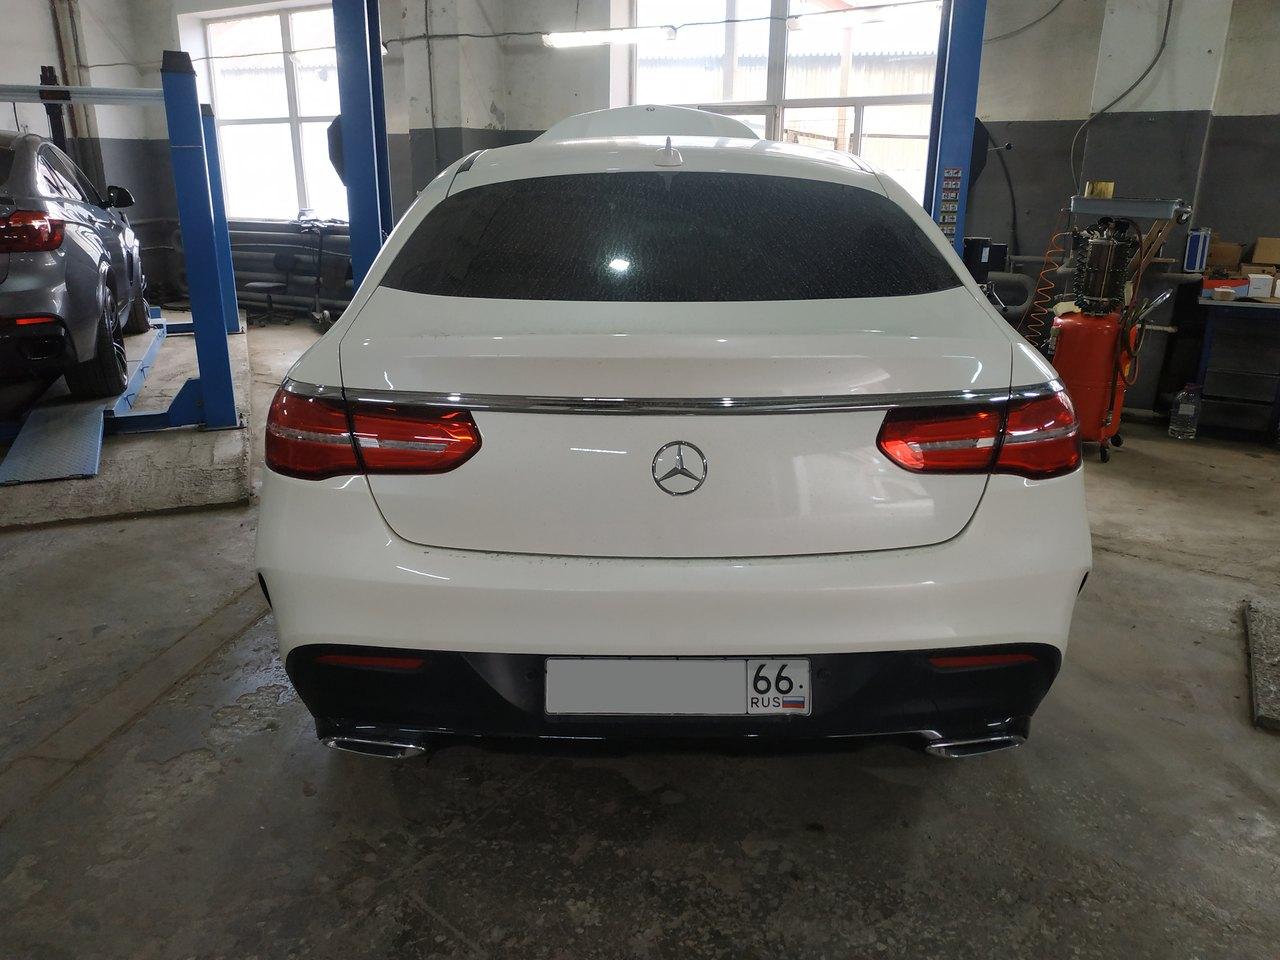 Mercedes GLE 350d 4МАТIС